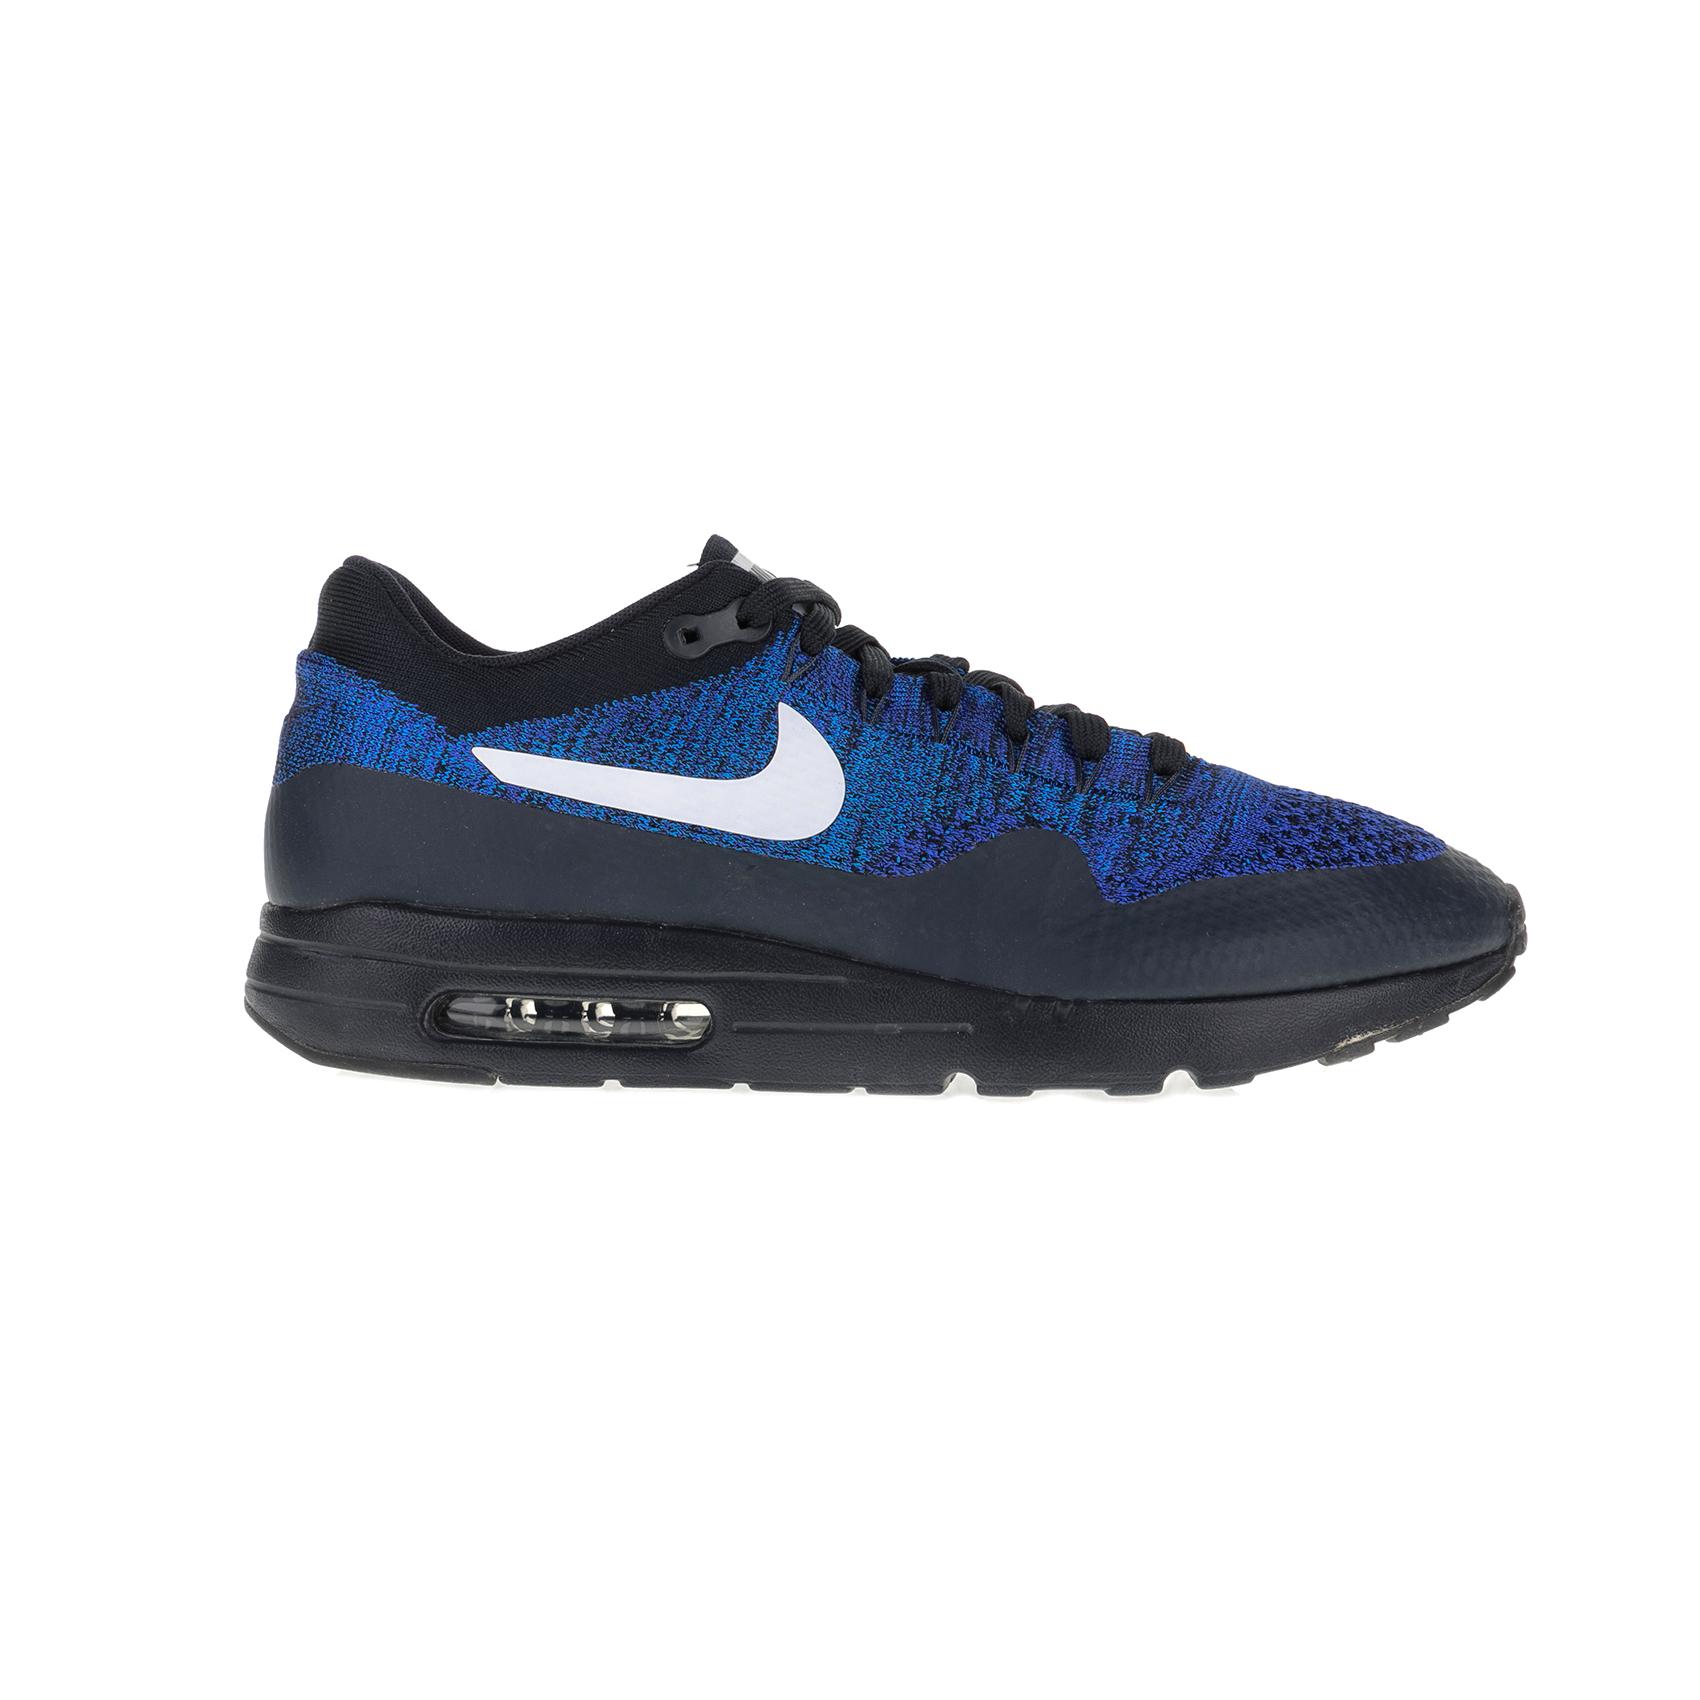 NIKE – Ανδρικά παπούτσια Nike AIR MAX 1 ULTRA FLYKNIT κόκκινα – μπλε